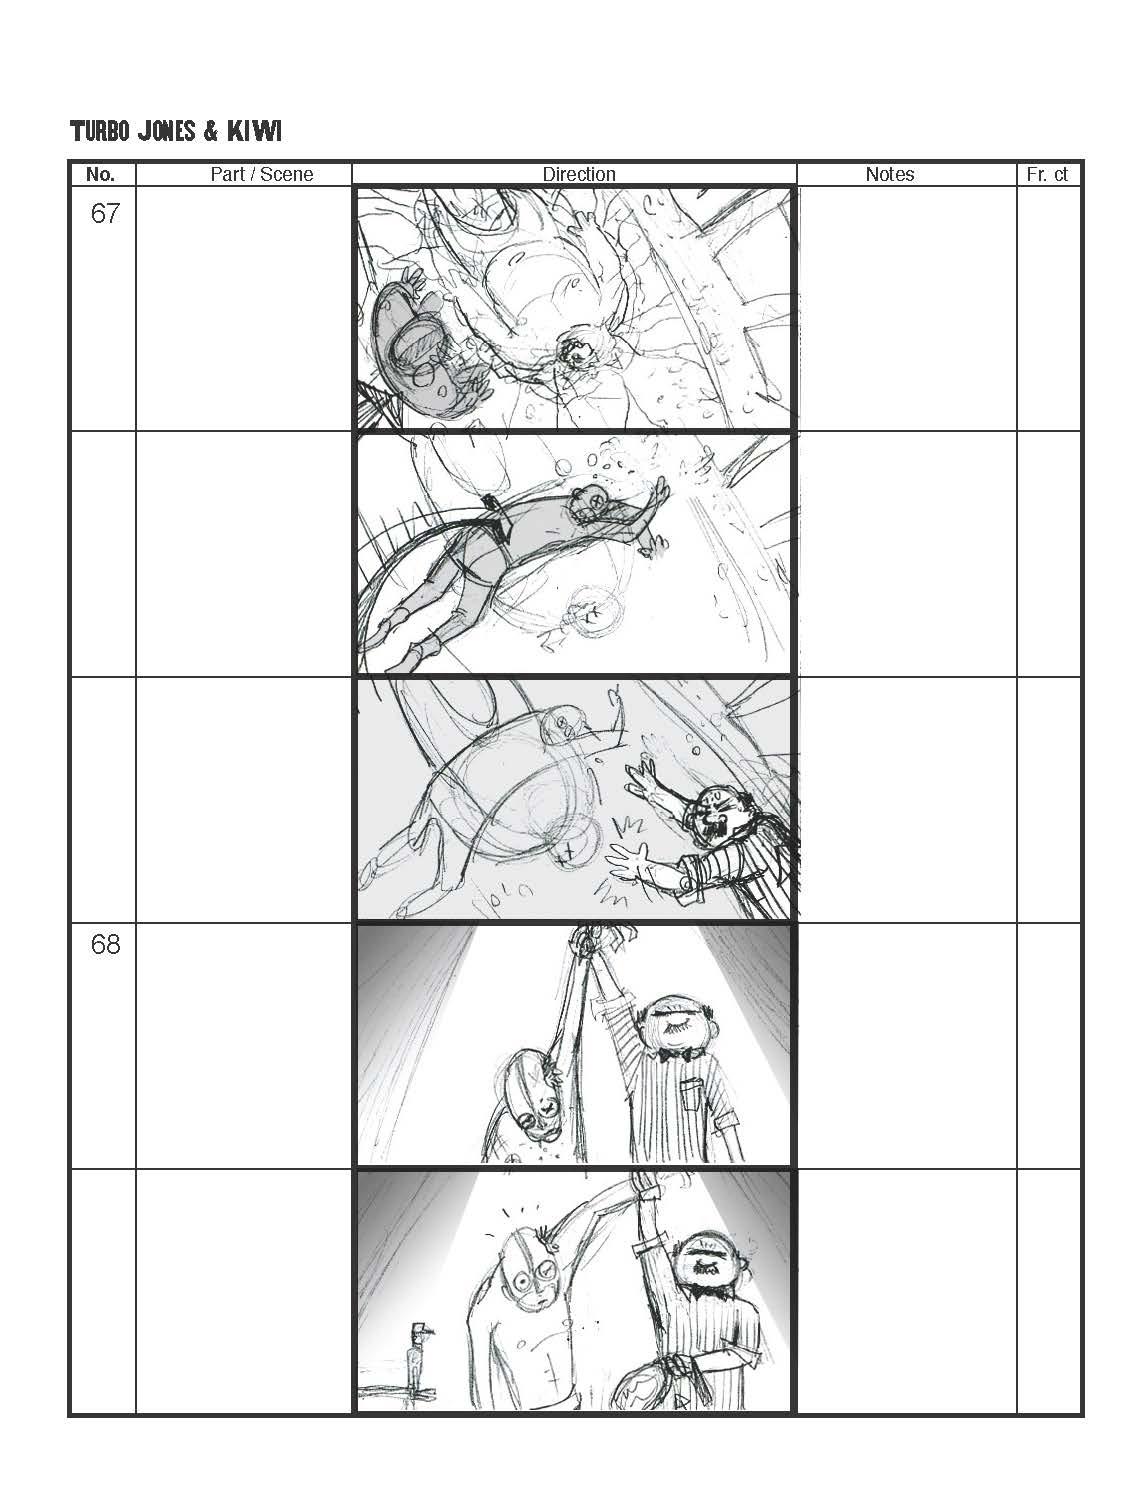 TJK_Storyboards_v01_HIGH_Page_33.jpg